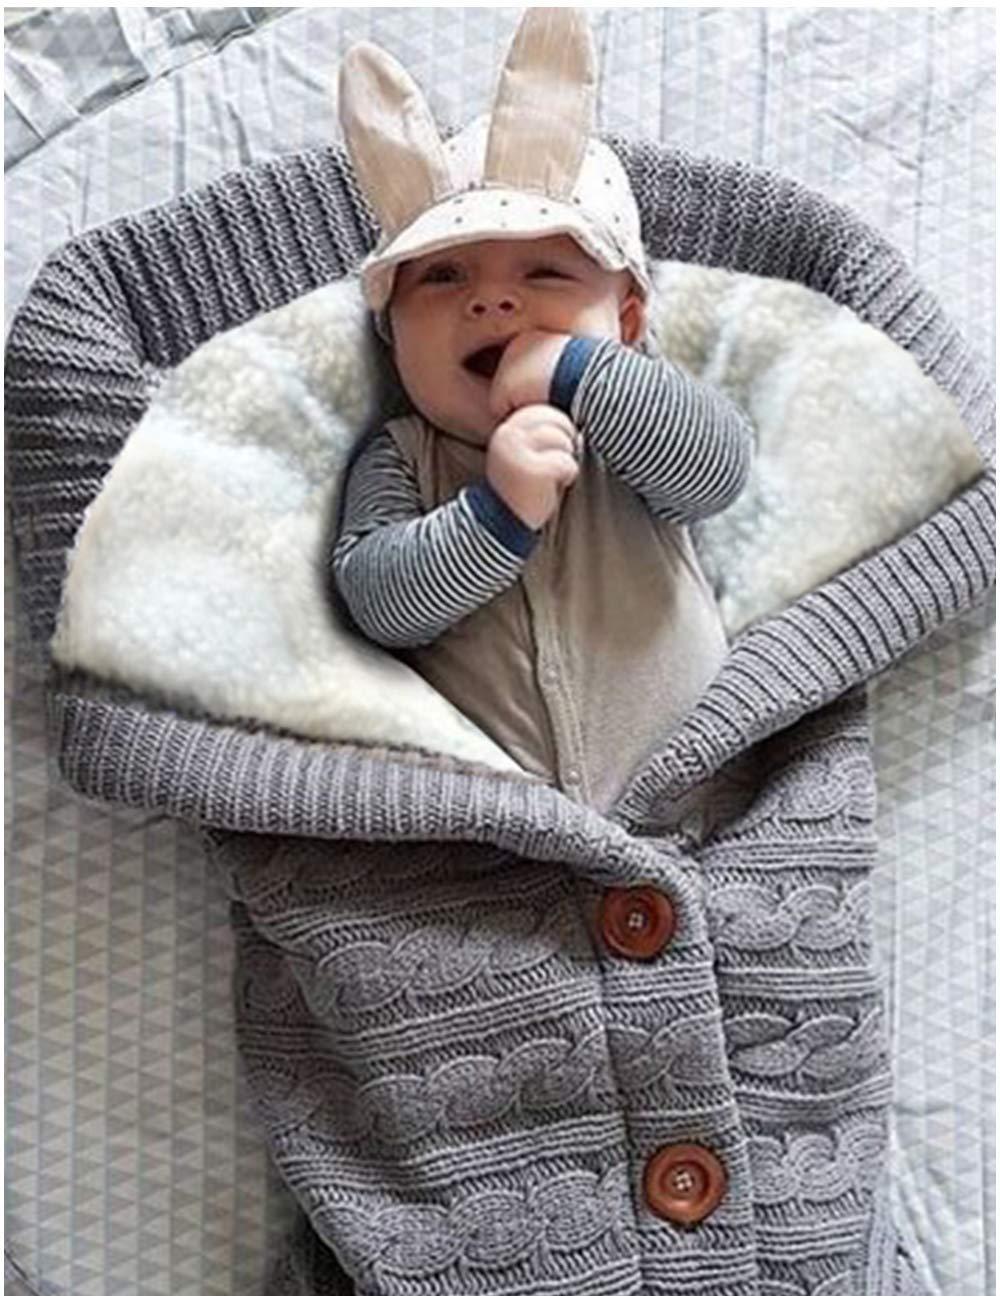 Unisex Infant Swaddle Blankets Newborn Baby Boy Girl Swaddle Soft Cotton Sleeping Bag Wrap Blanket Sack Stroller for Boys and Girls